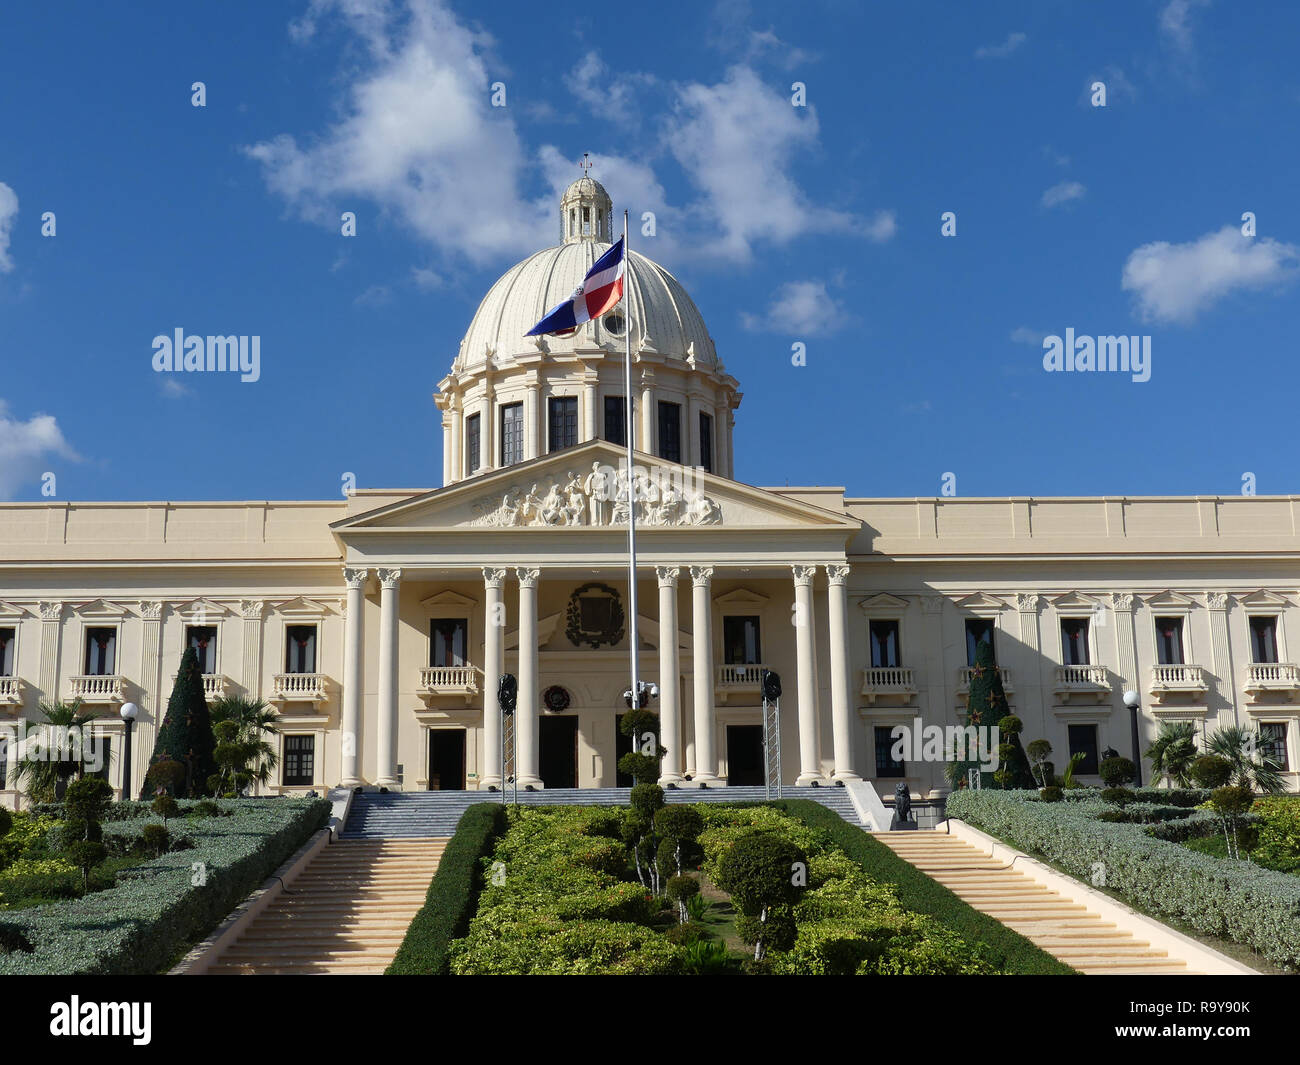 PRESIDENTIAL PALACE in Santo Domingo, Dominican Republic.Photo: Tony Gale - Stock Image